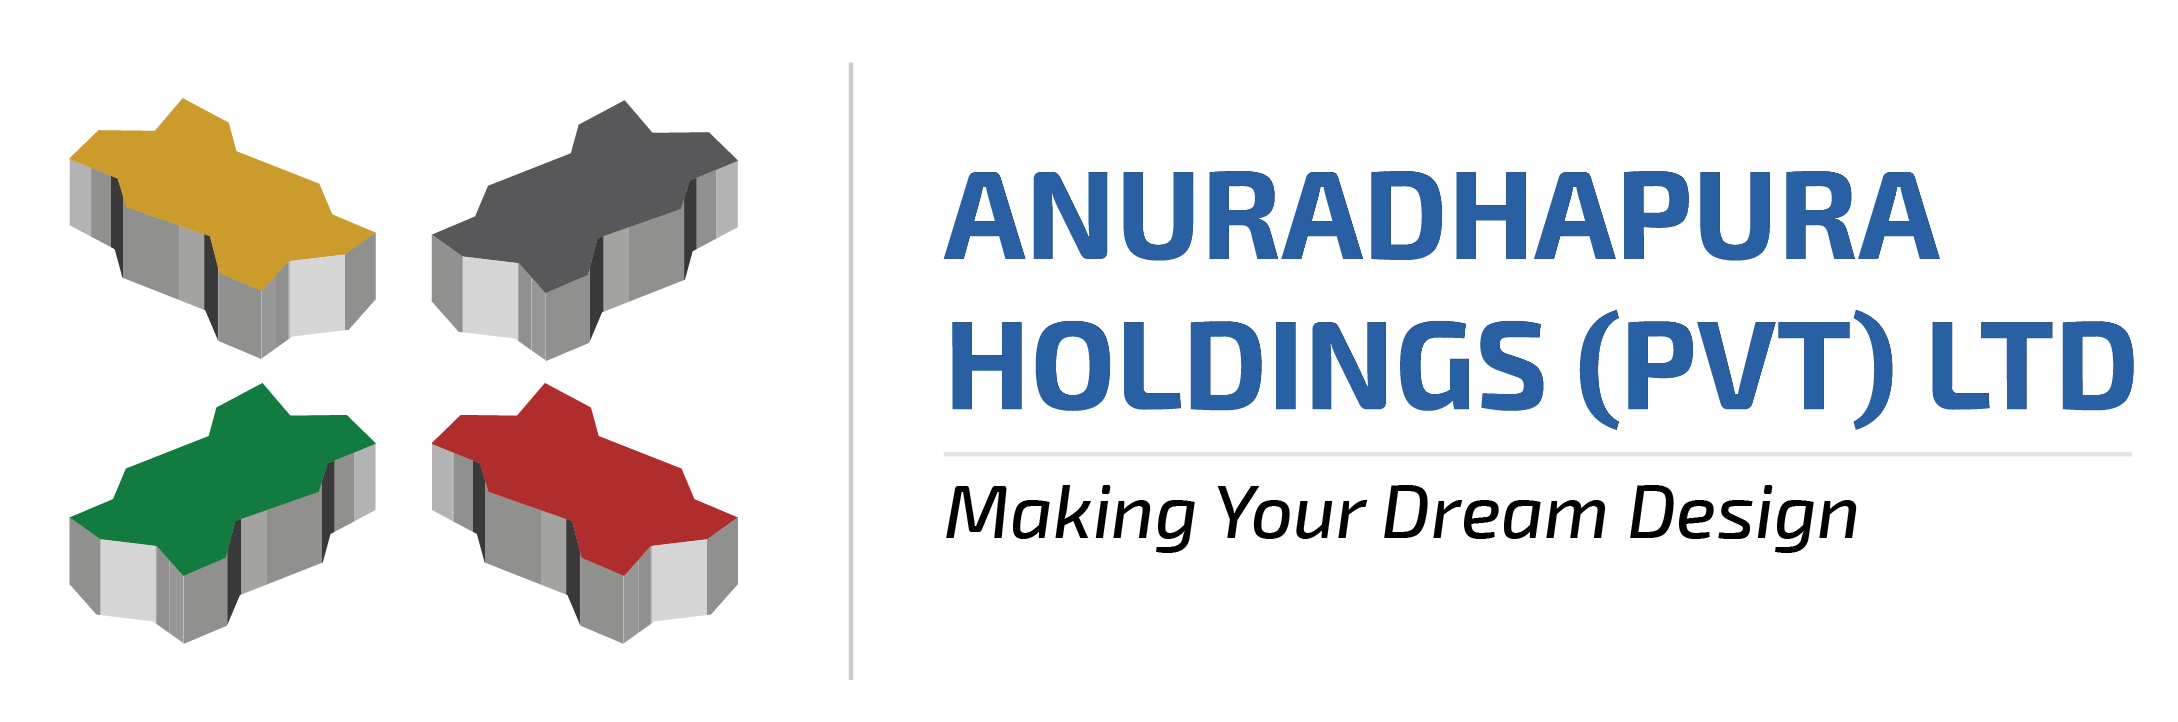 Anuradhapura Holdings